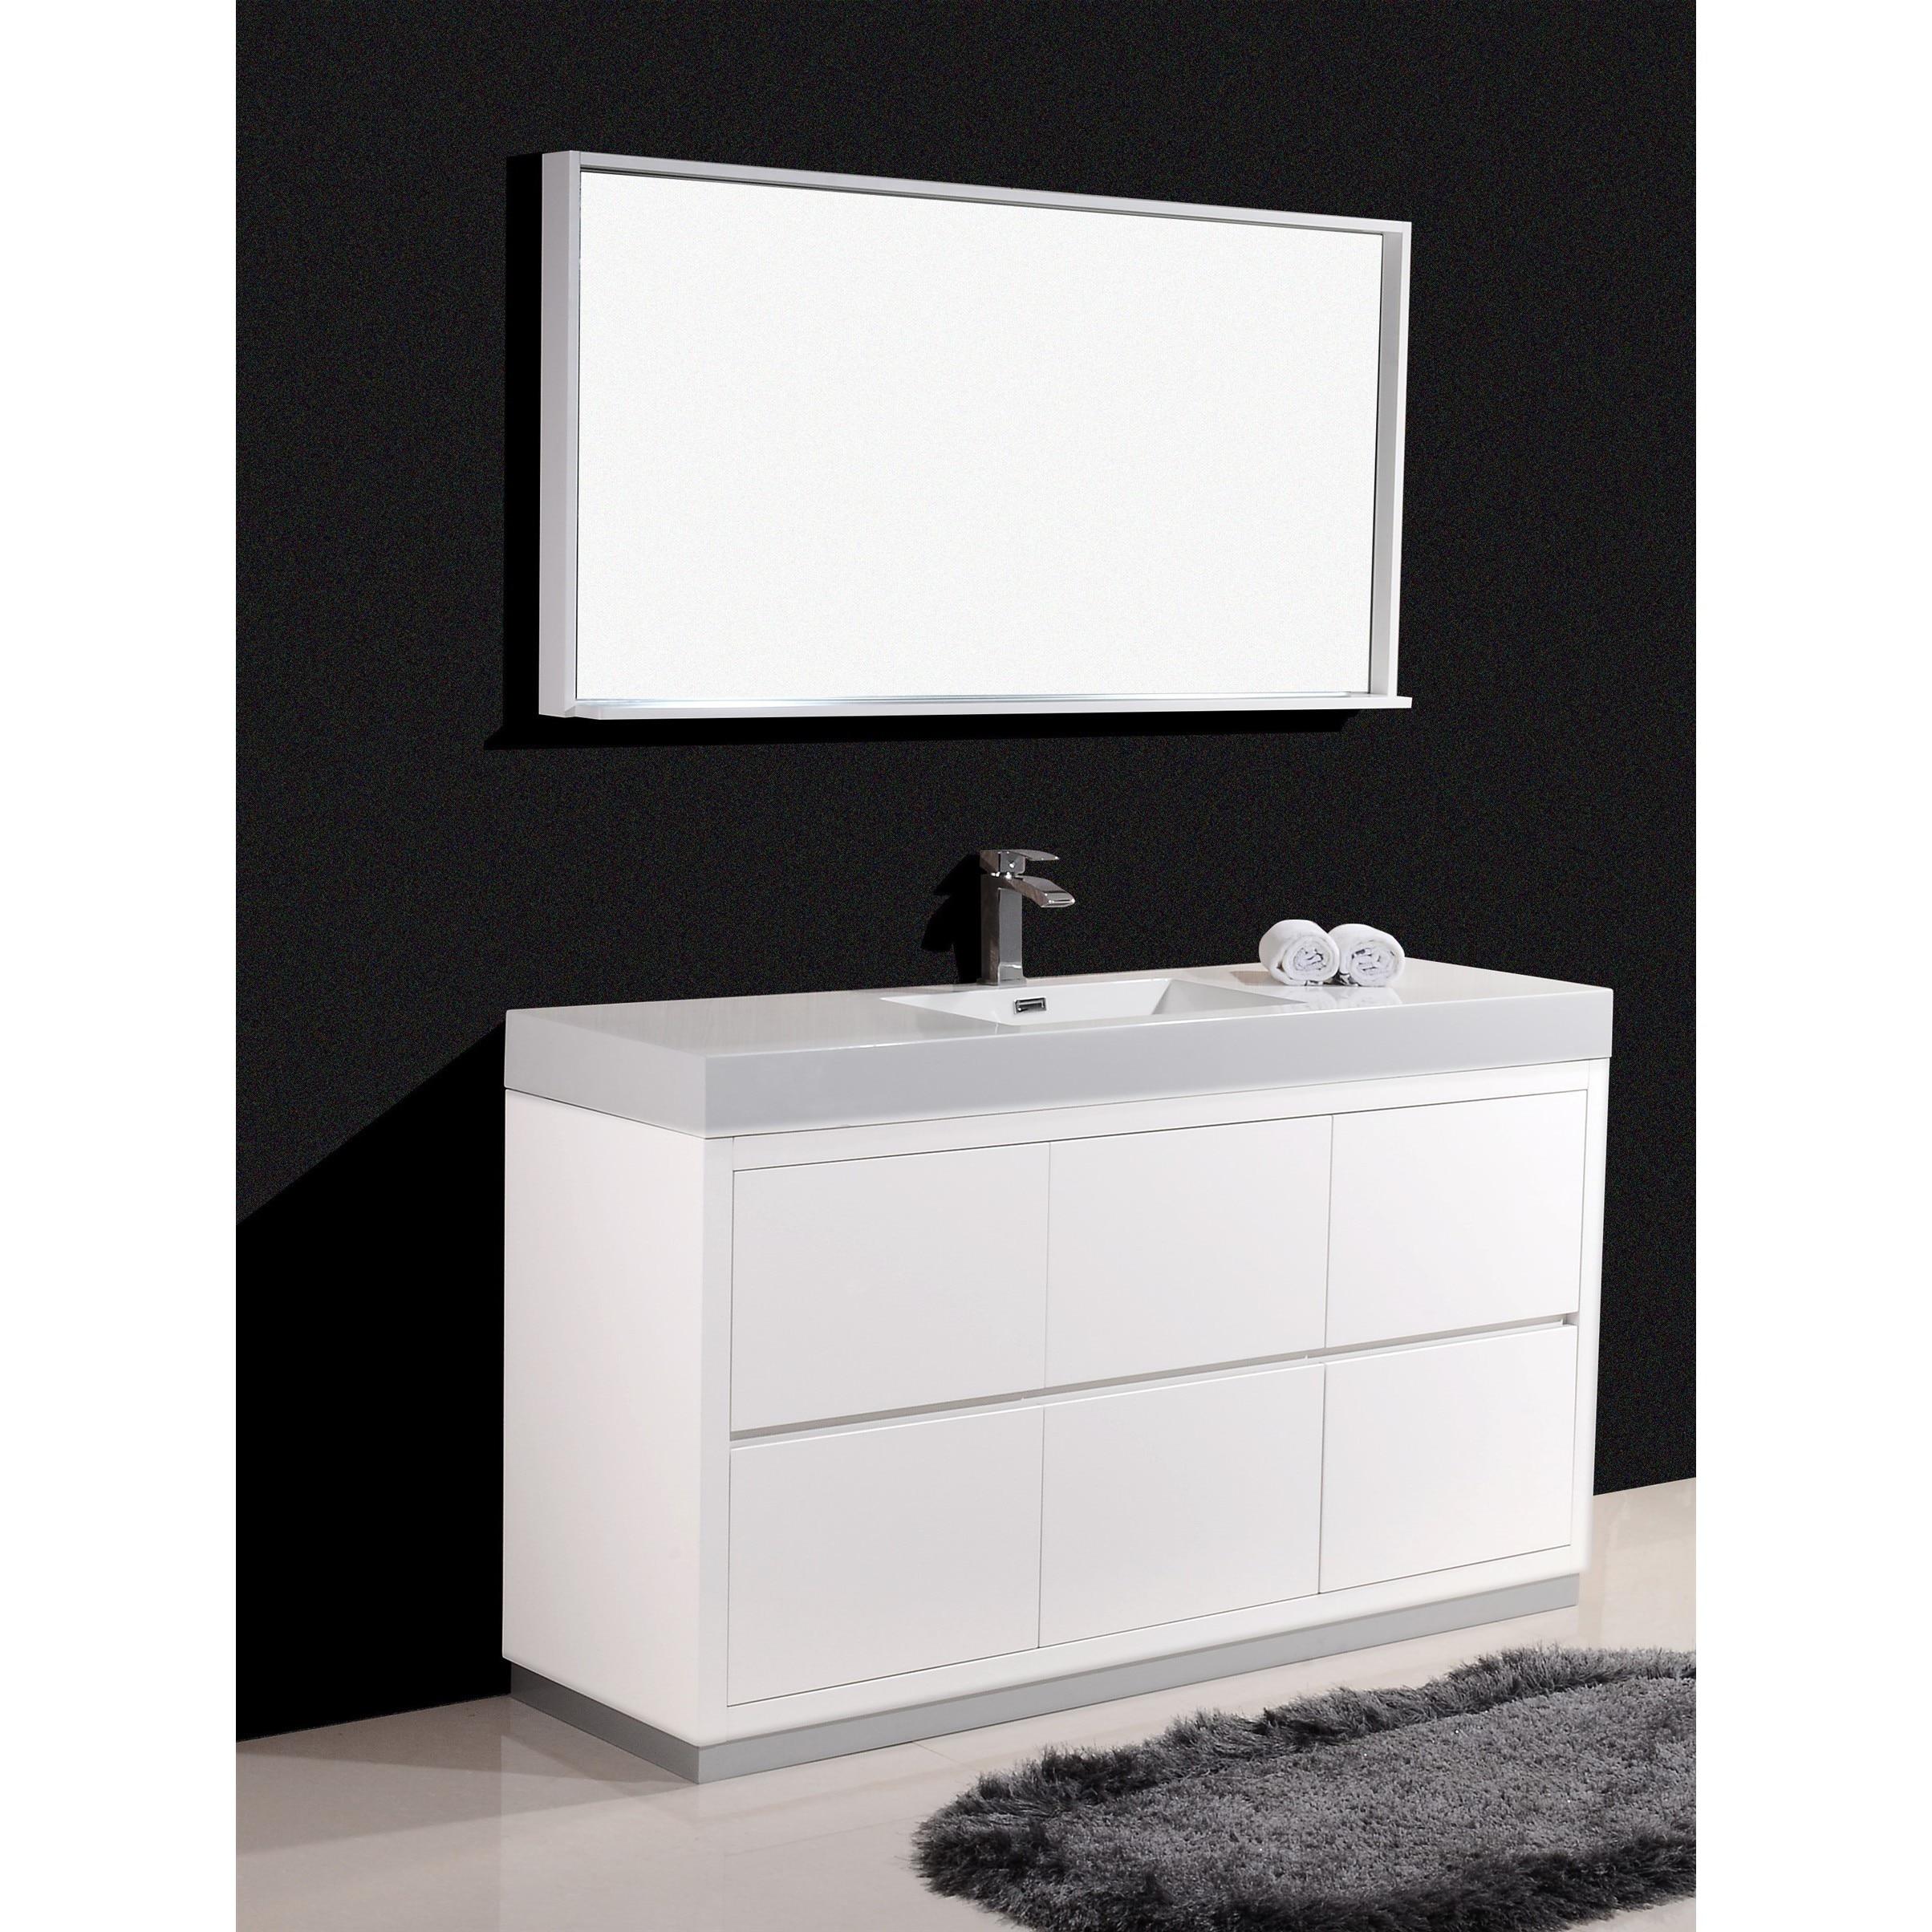 Kubebath Bliss 59 Inch Single Sink Bathroom Vanity Free Shipping Today 11916061